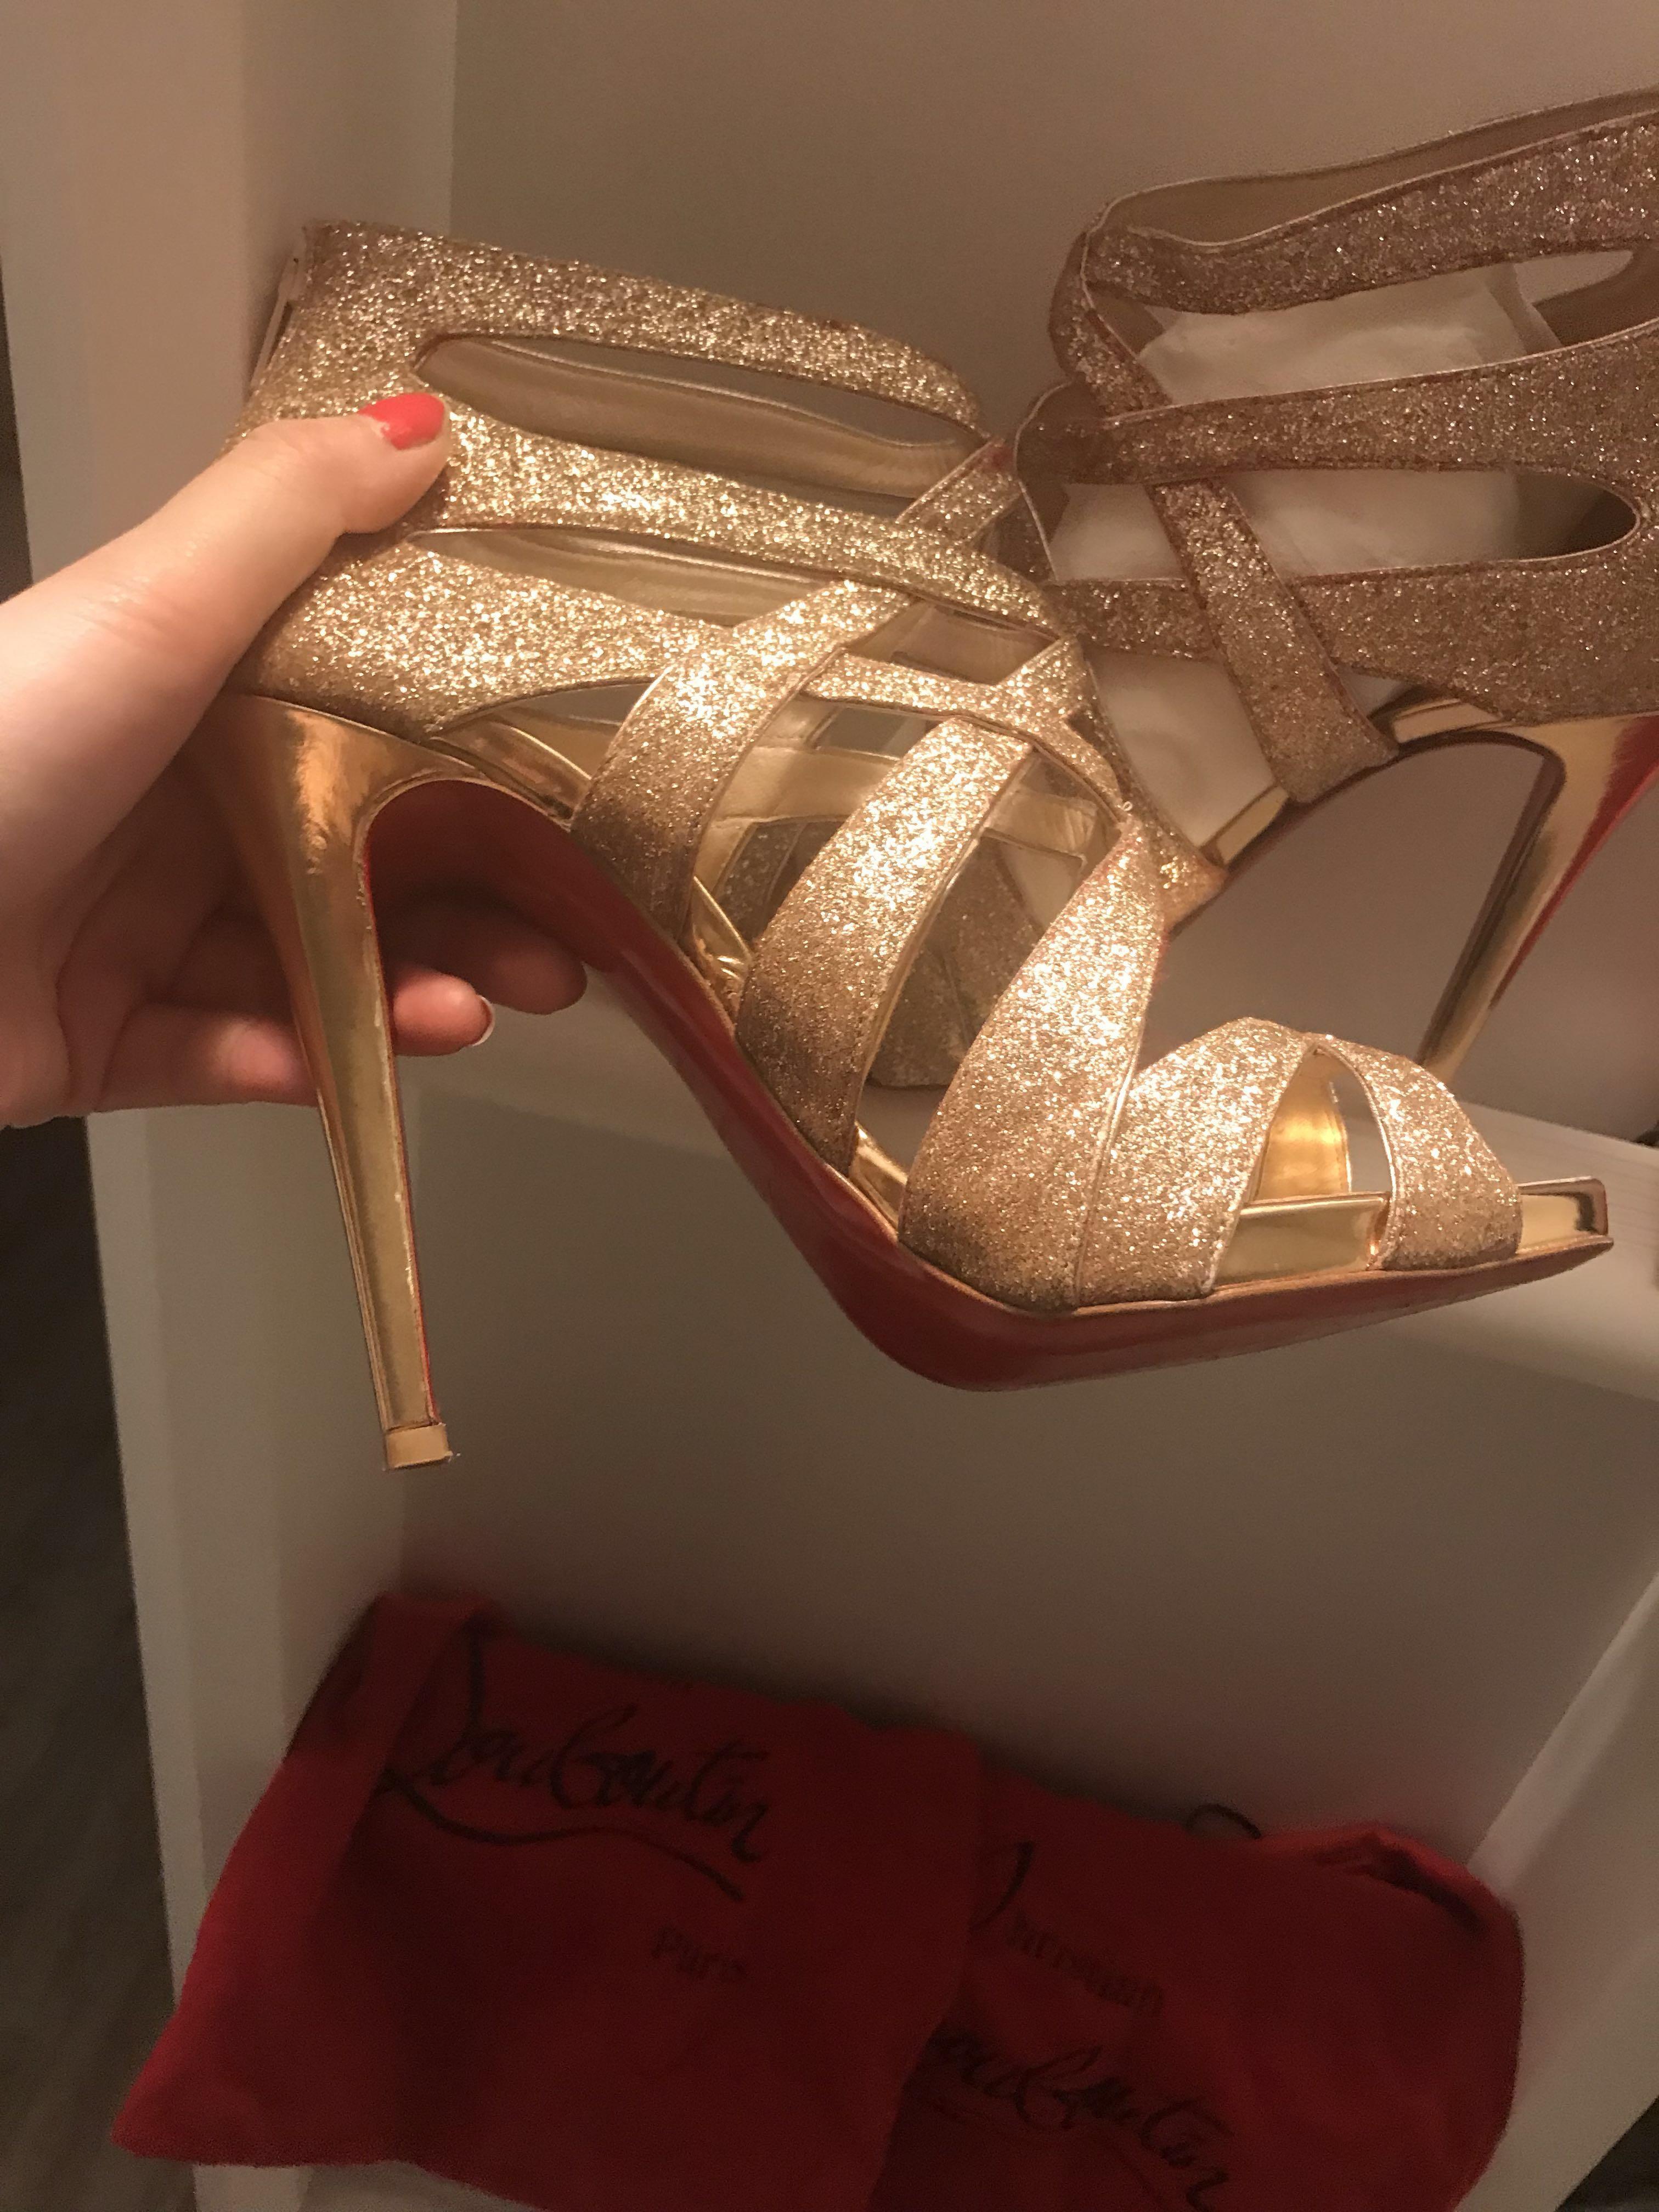 Christian Louboutin Shoes 38.5